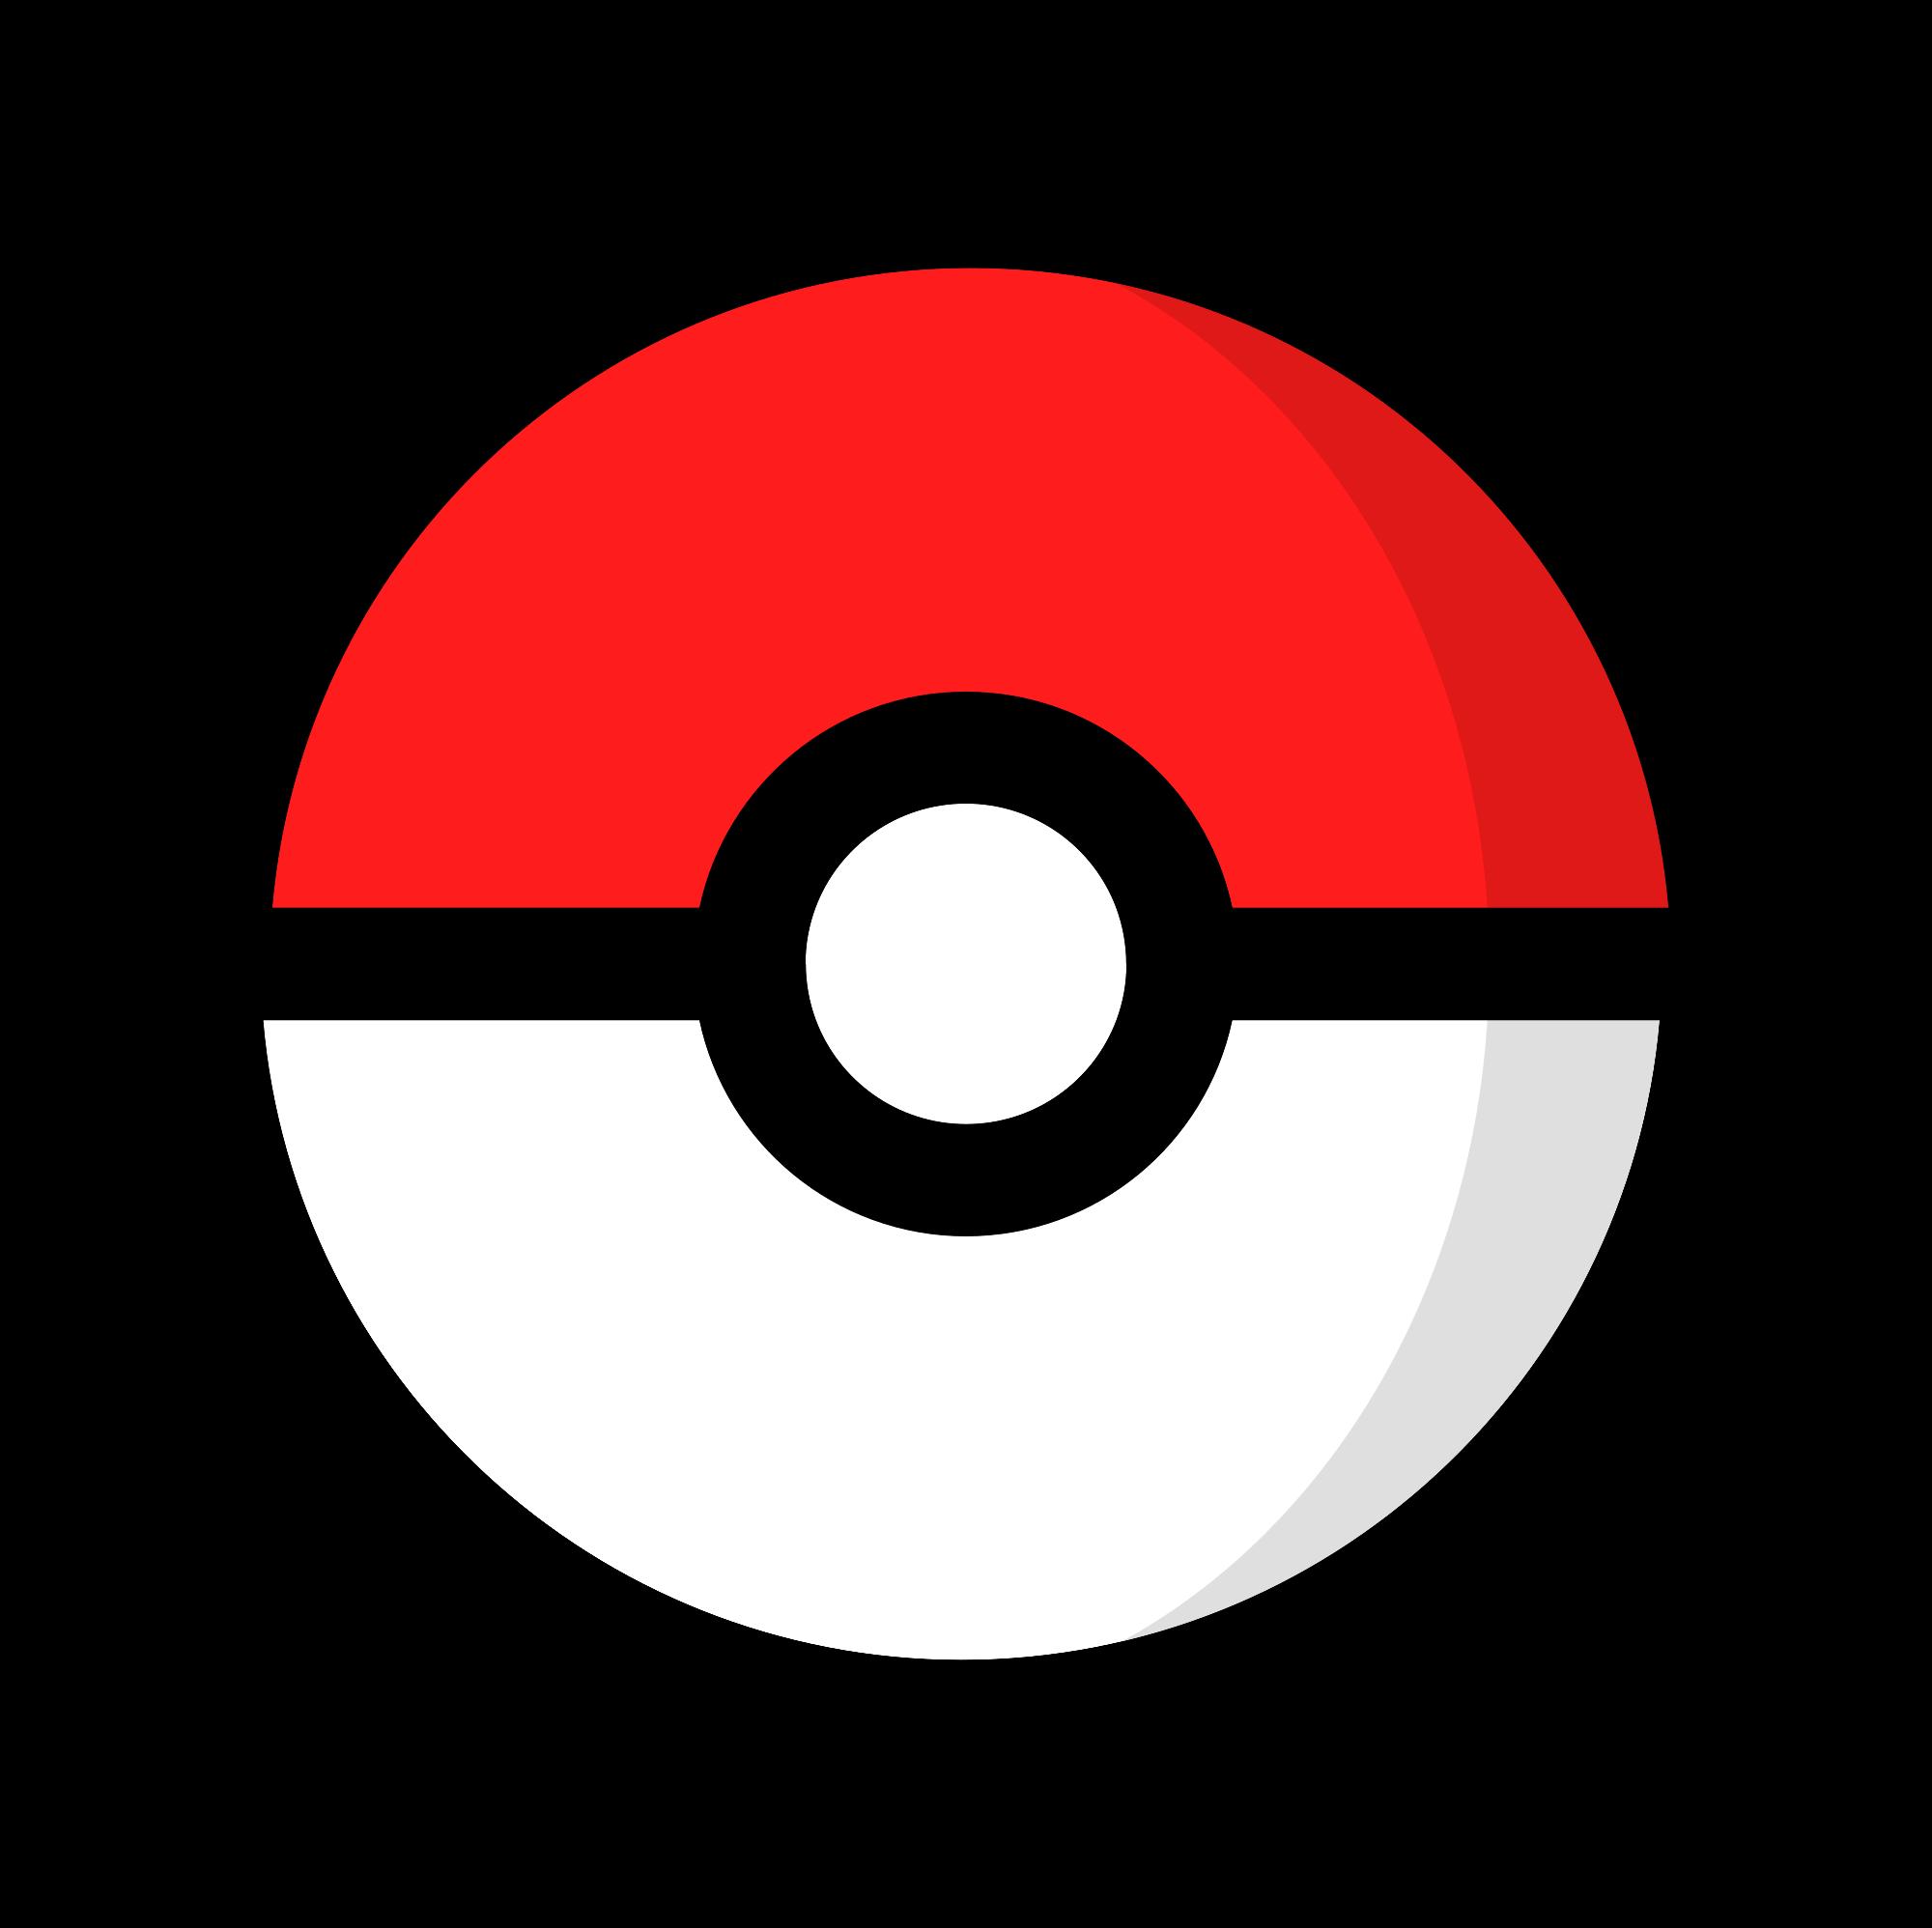 File pok ball icon. Pokeball clipart pdf